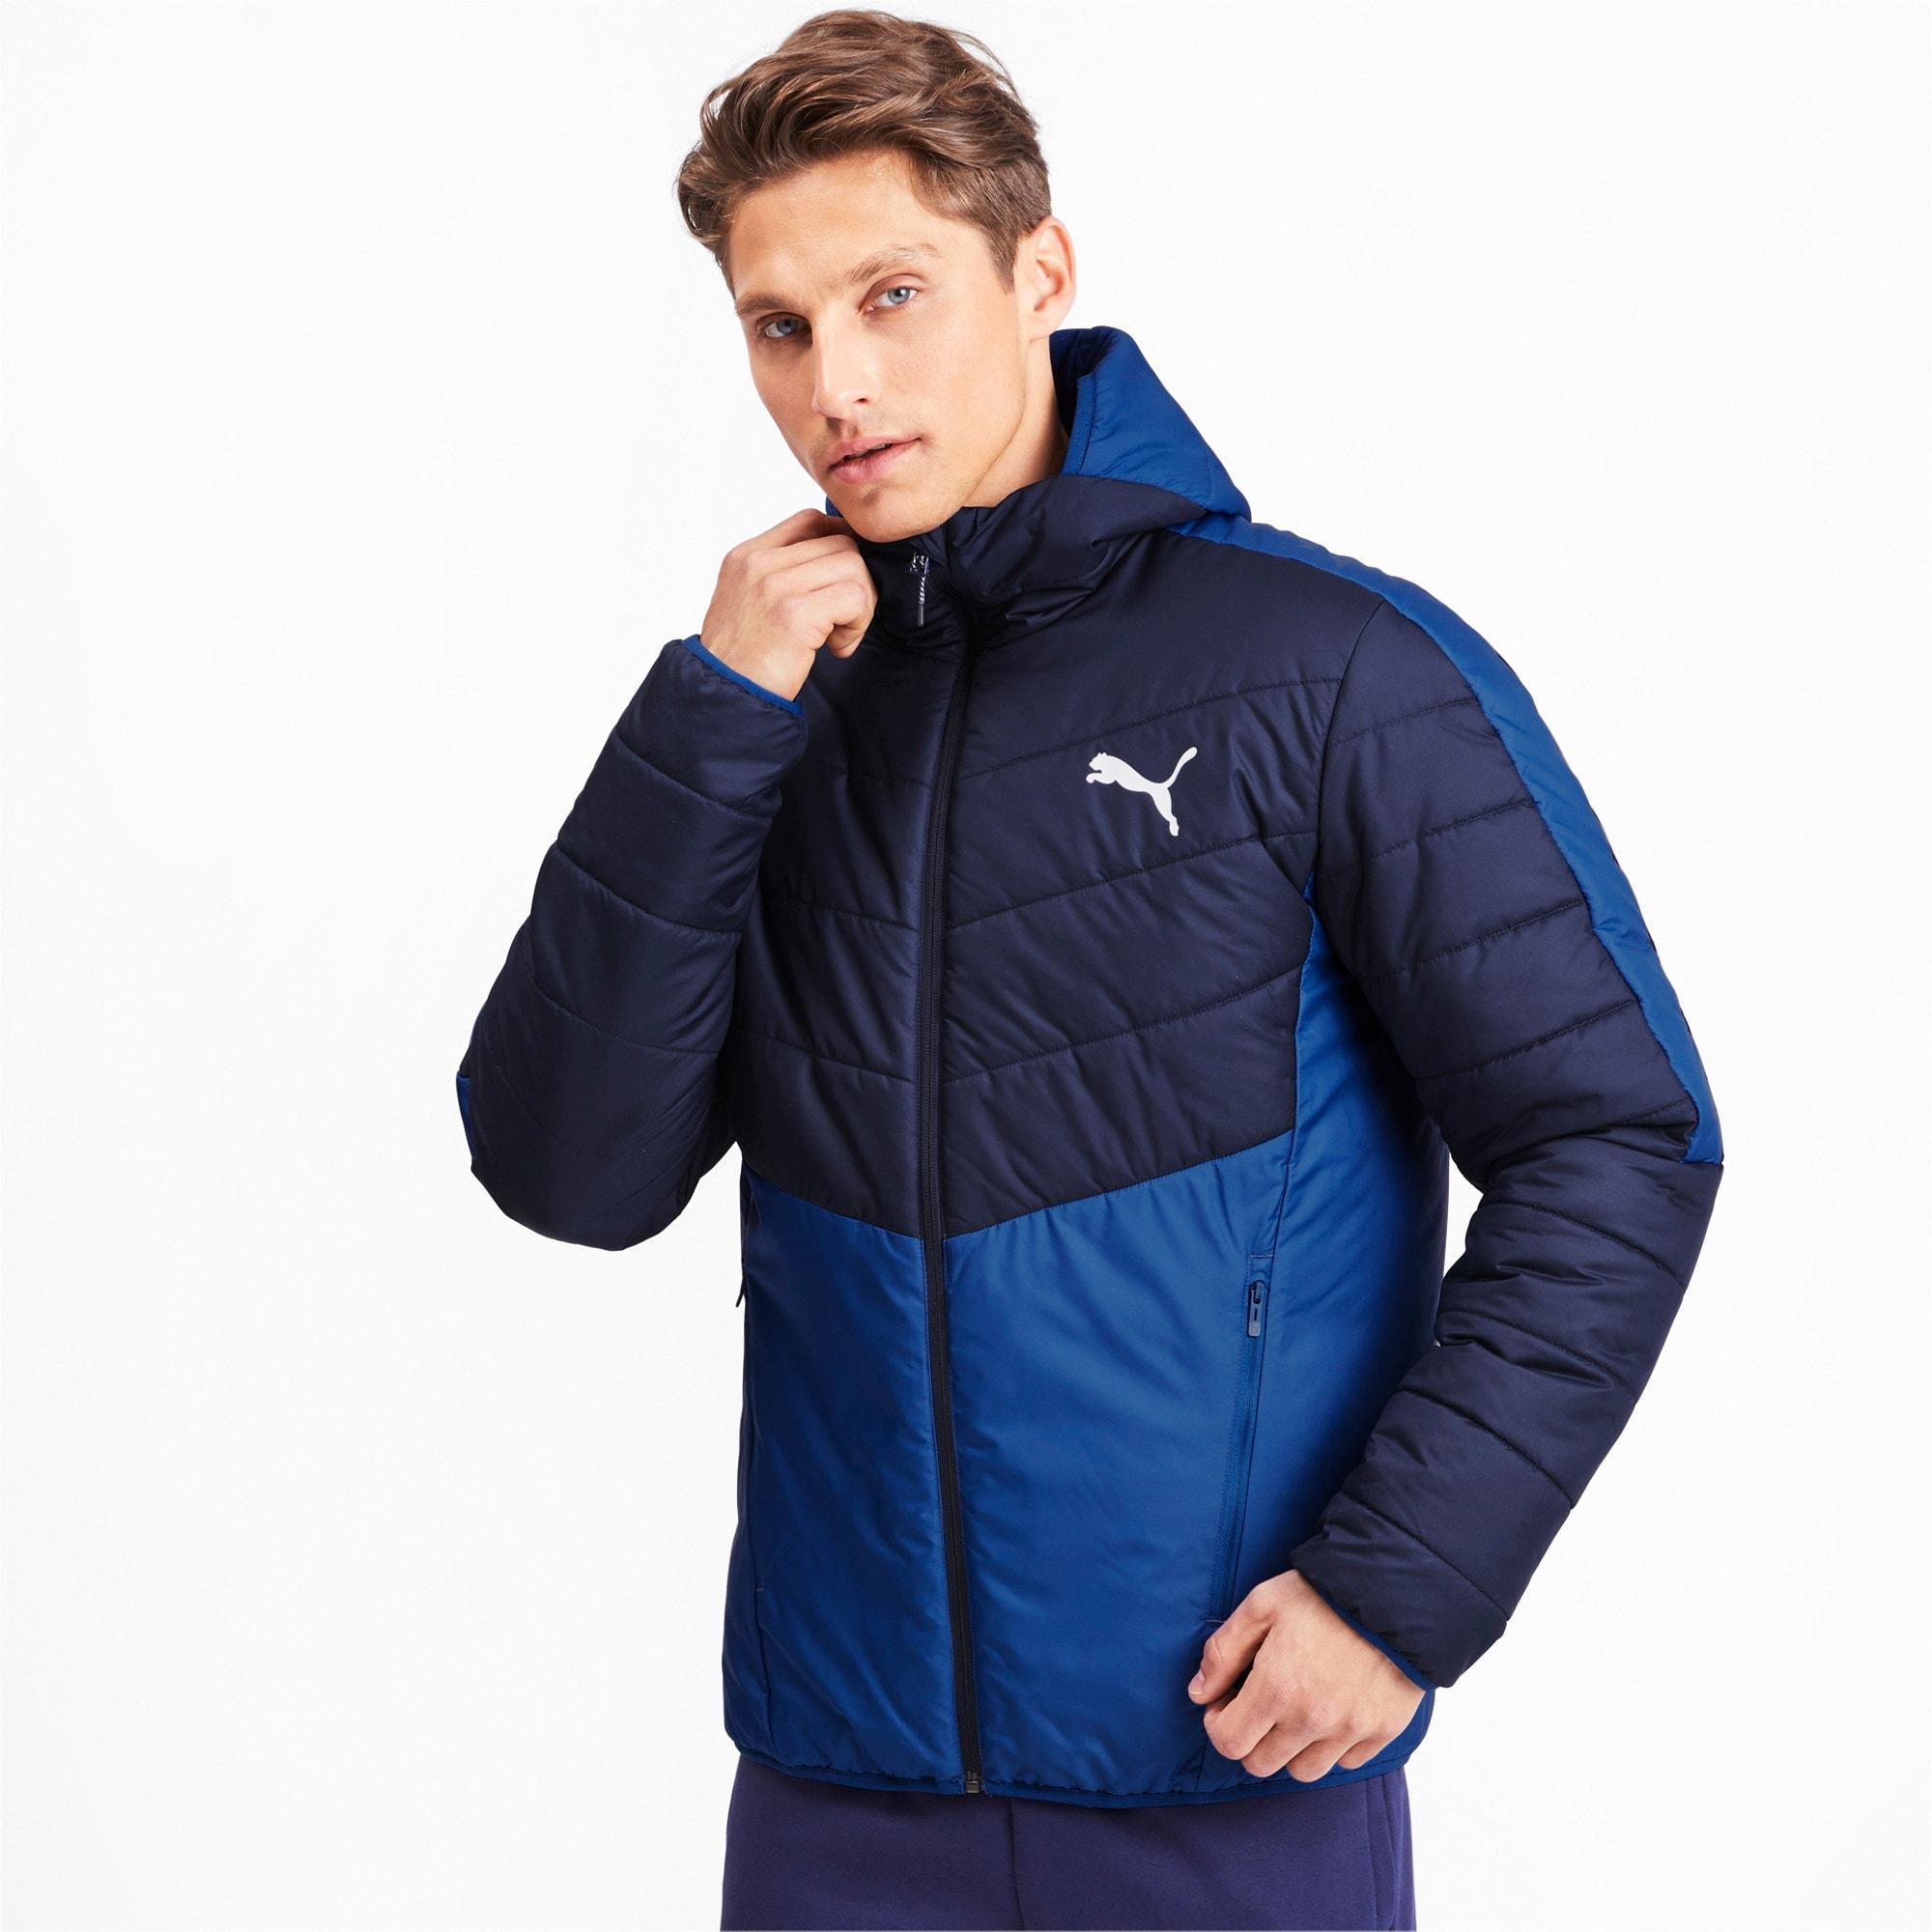 Thumbnail 2 of warmCELL Men's Padded Jacket, Galaxy Blue-Peacoat, medium